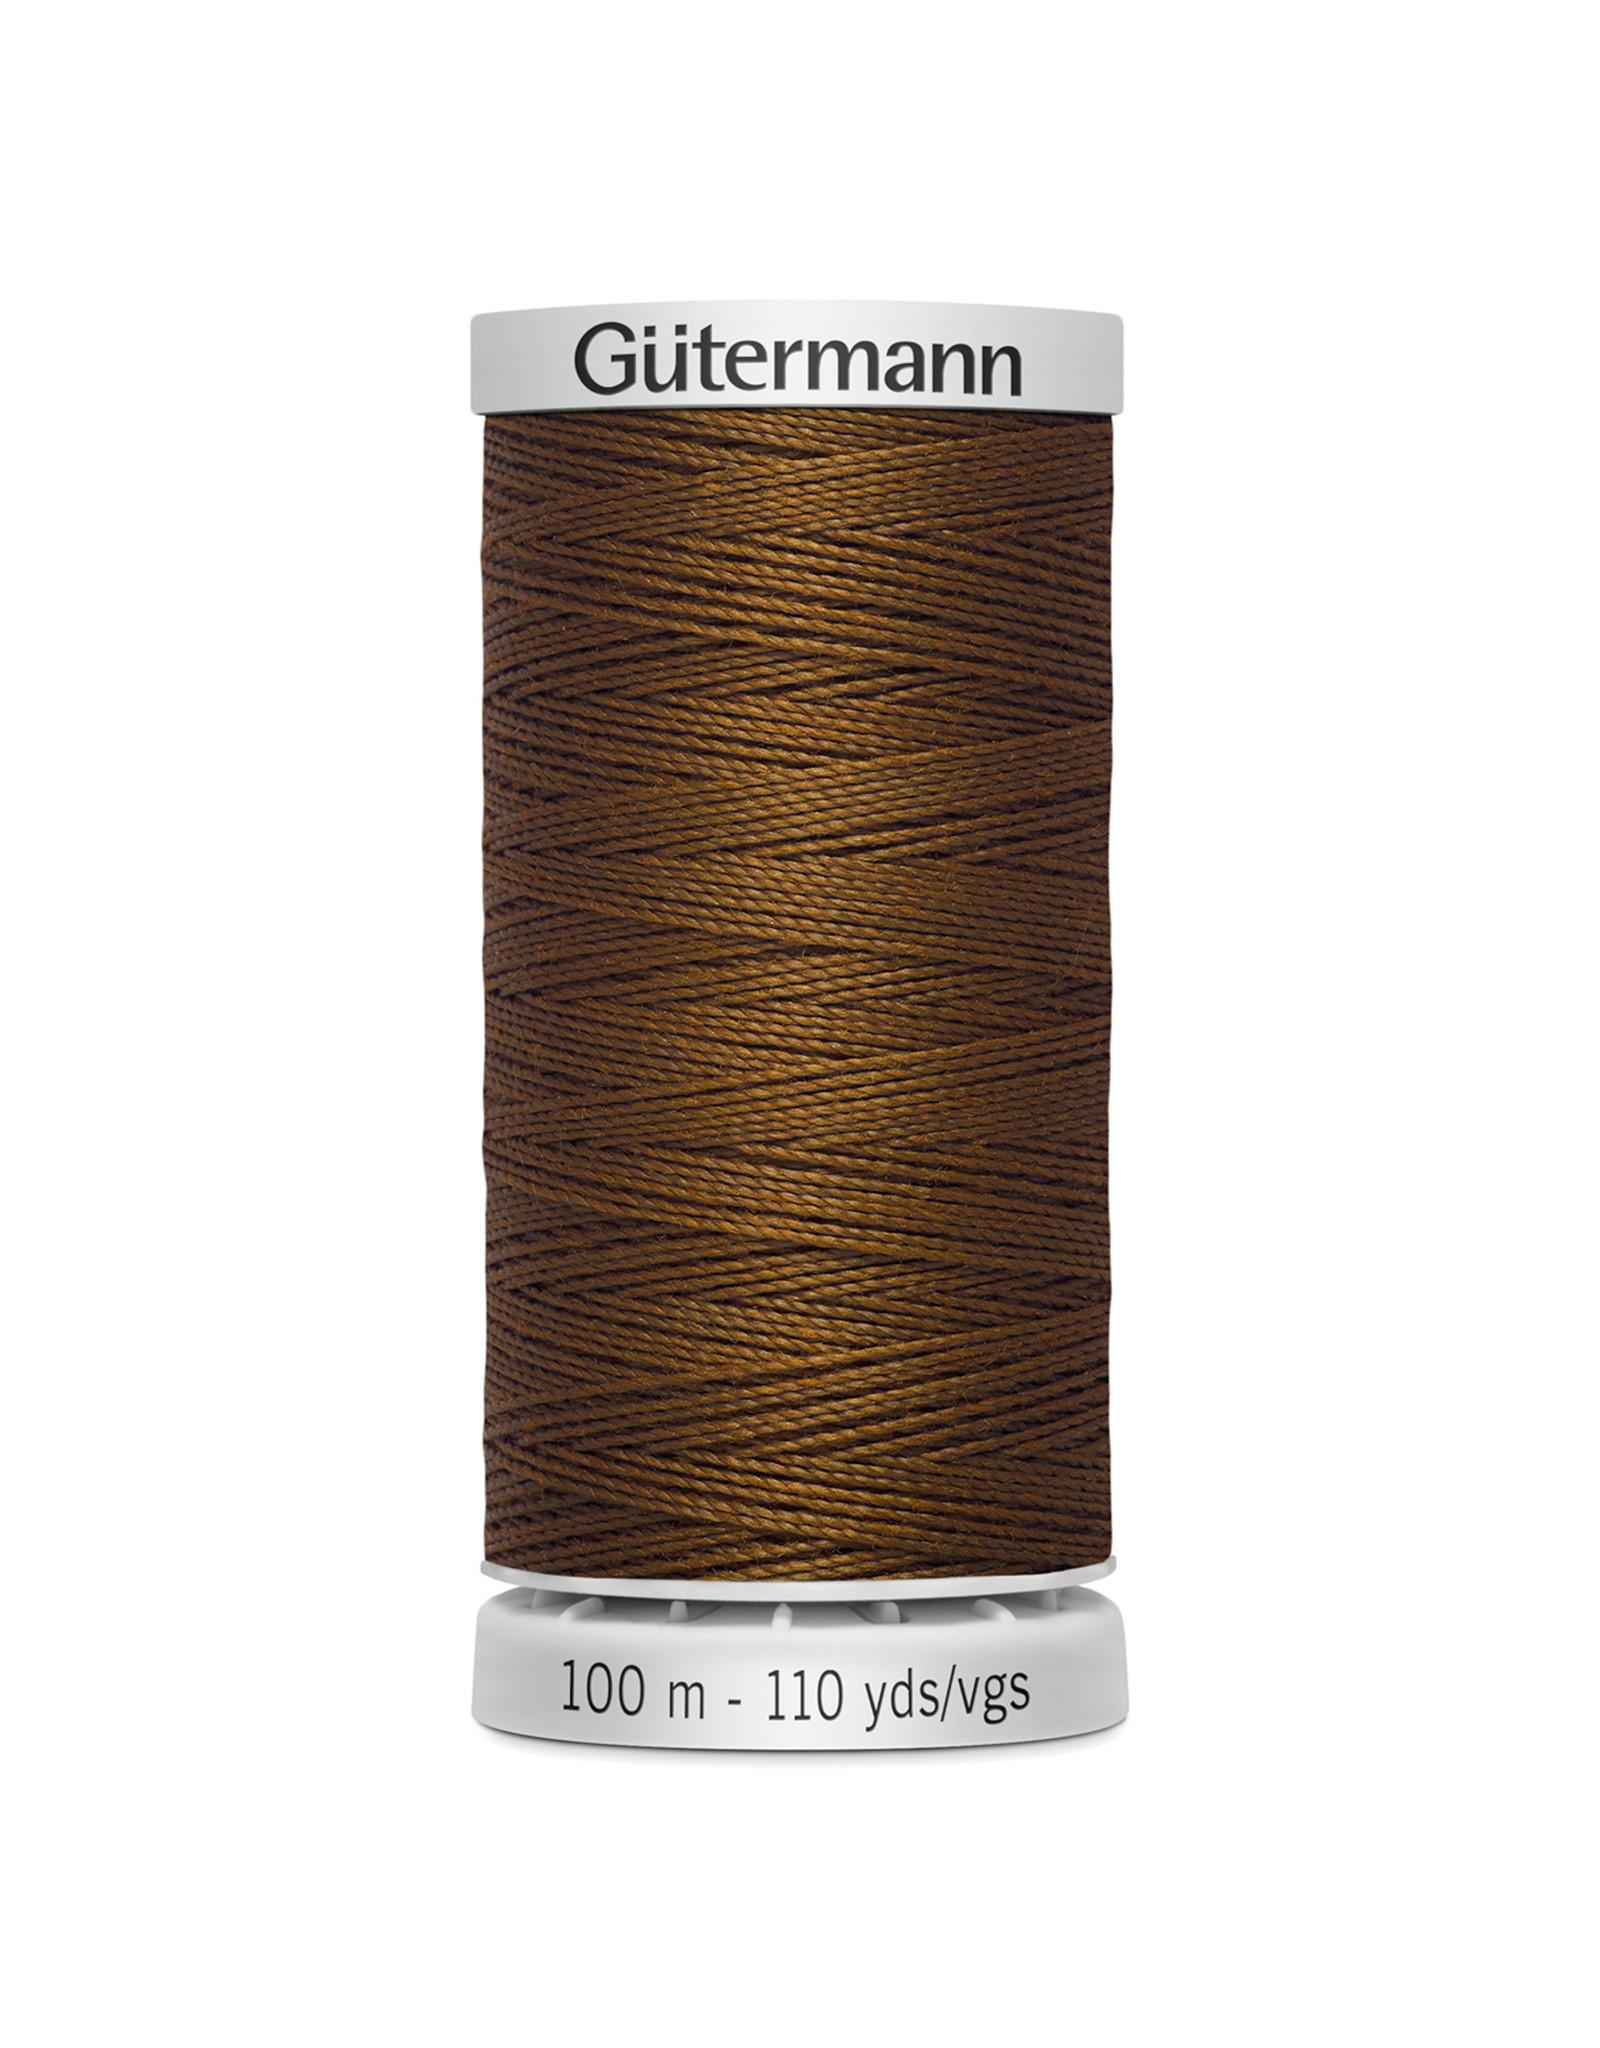 Gütermann Gütermann Super Strong thread 100 m - 650